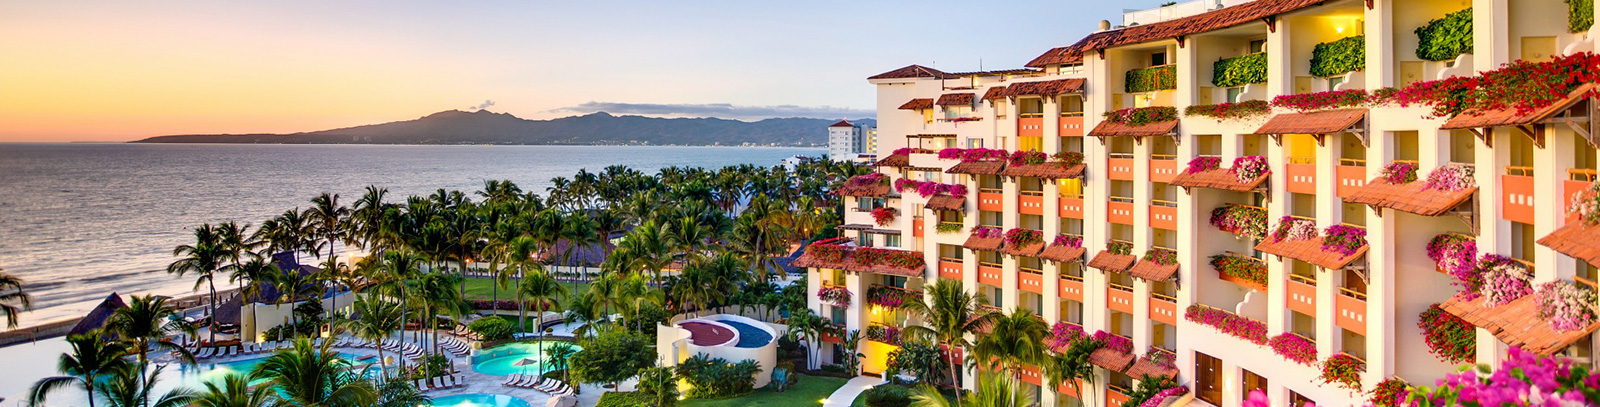 Location of Grand Velas Riviera Nayarit, Mexico